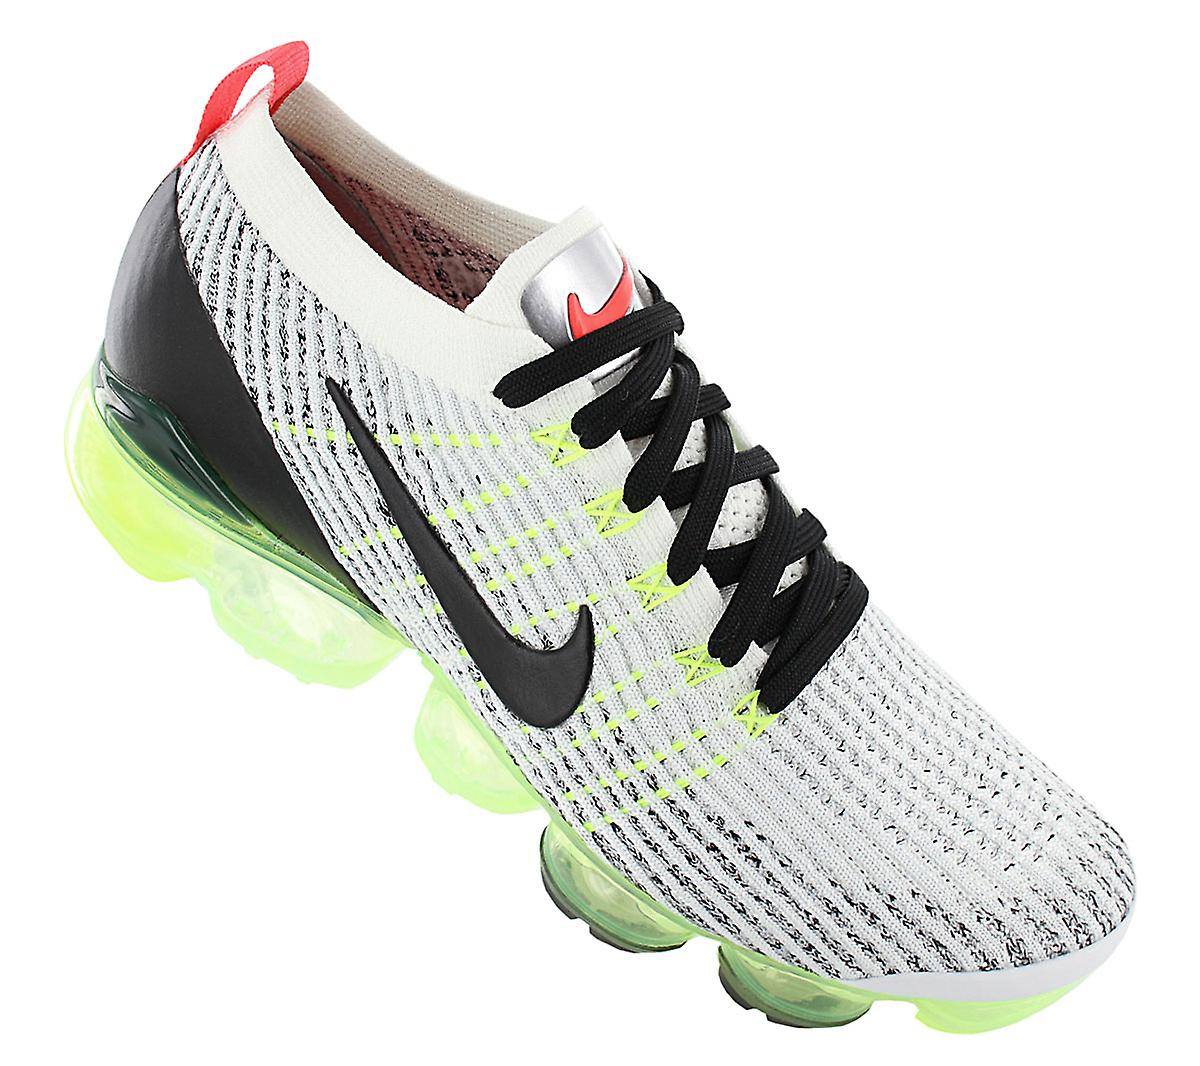 Nike Air VaporMax Flyknit 3 AJ6900-100 Herren Schuhe Weiß Sneakers Sportschuhe